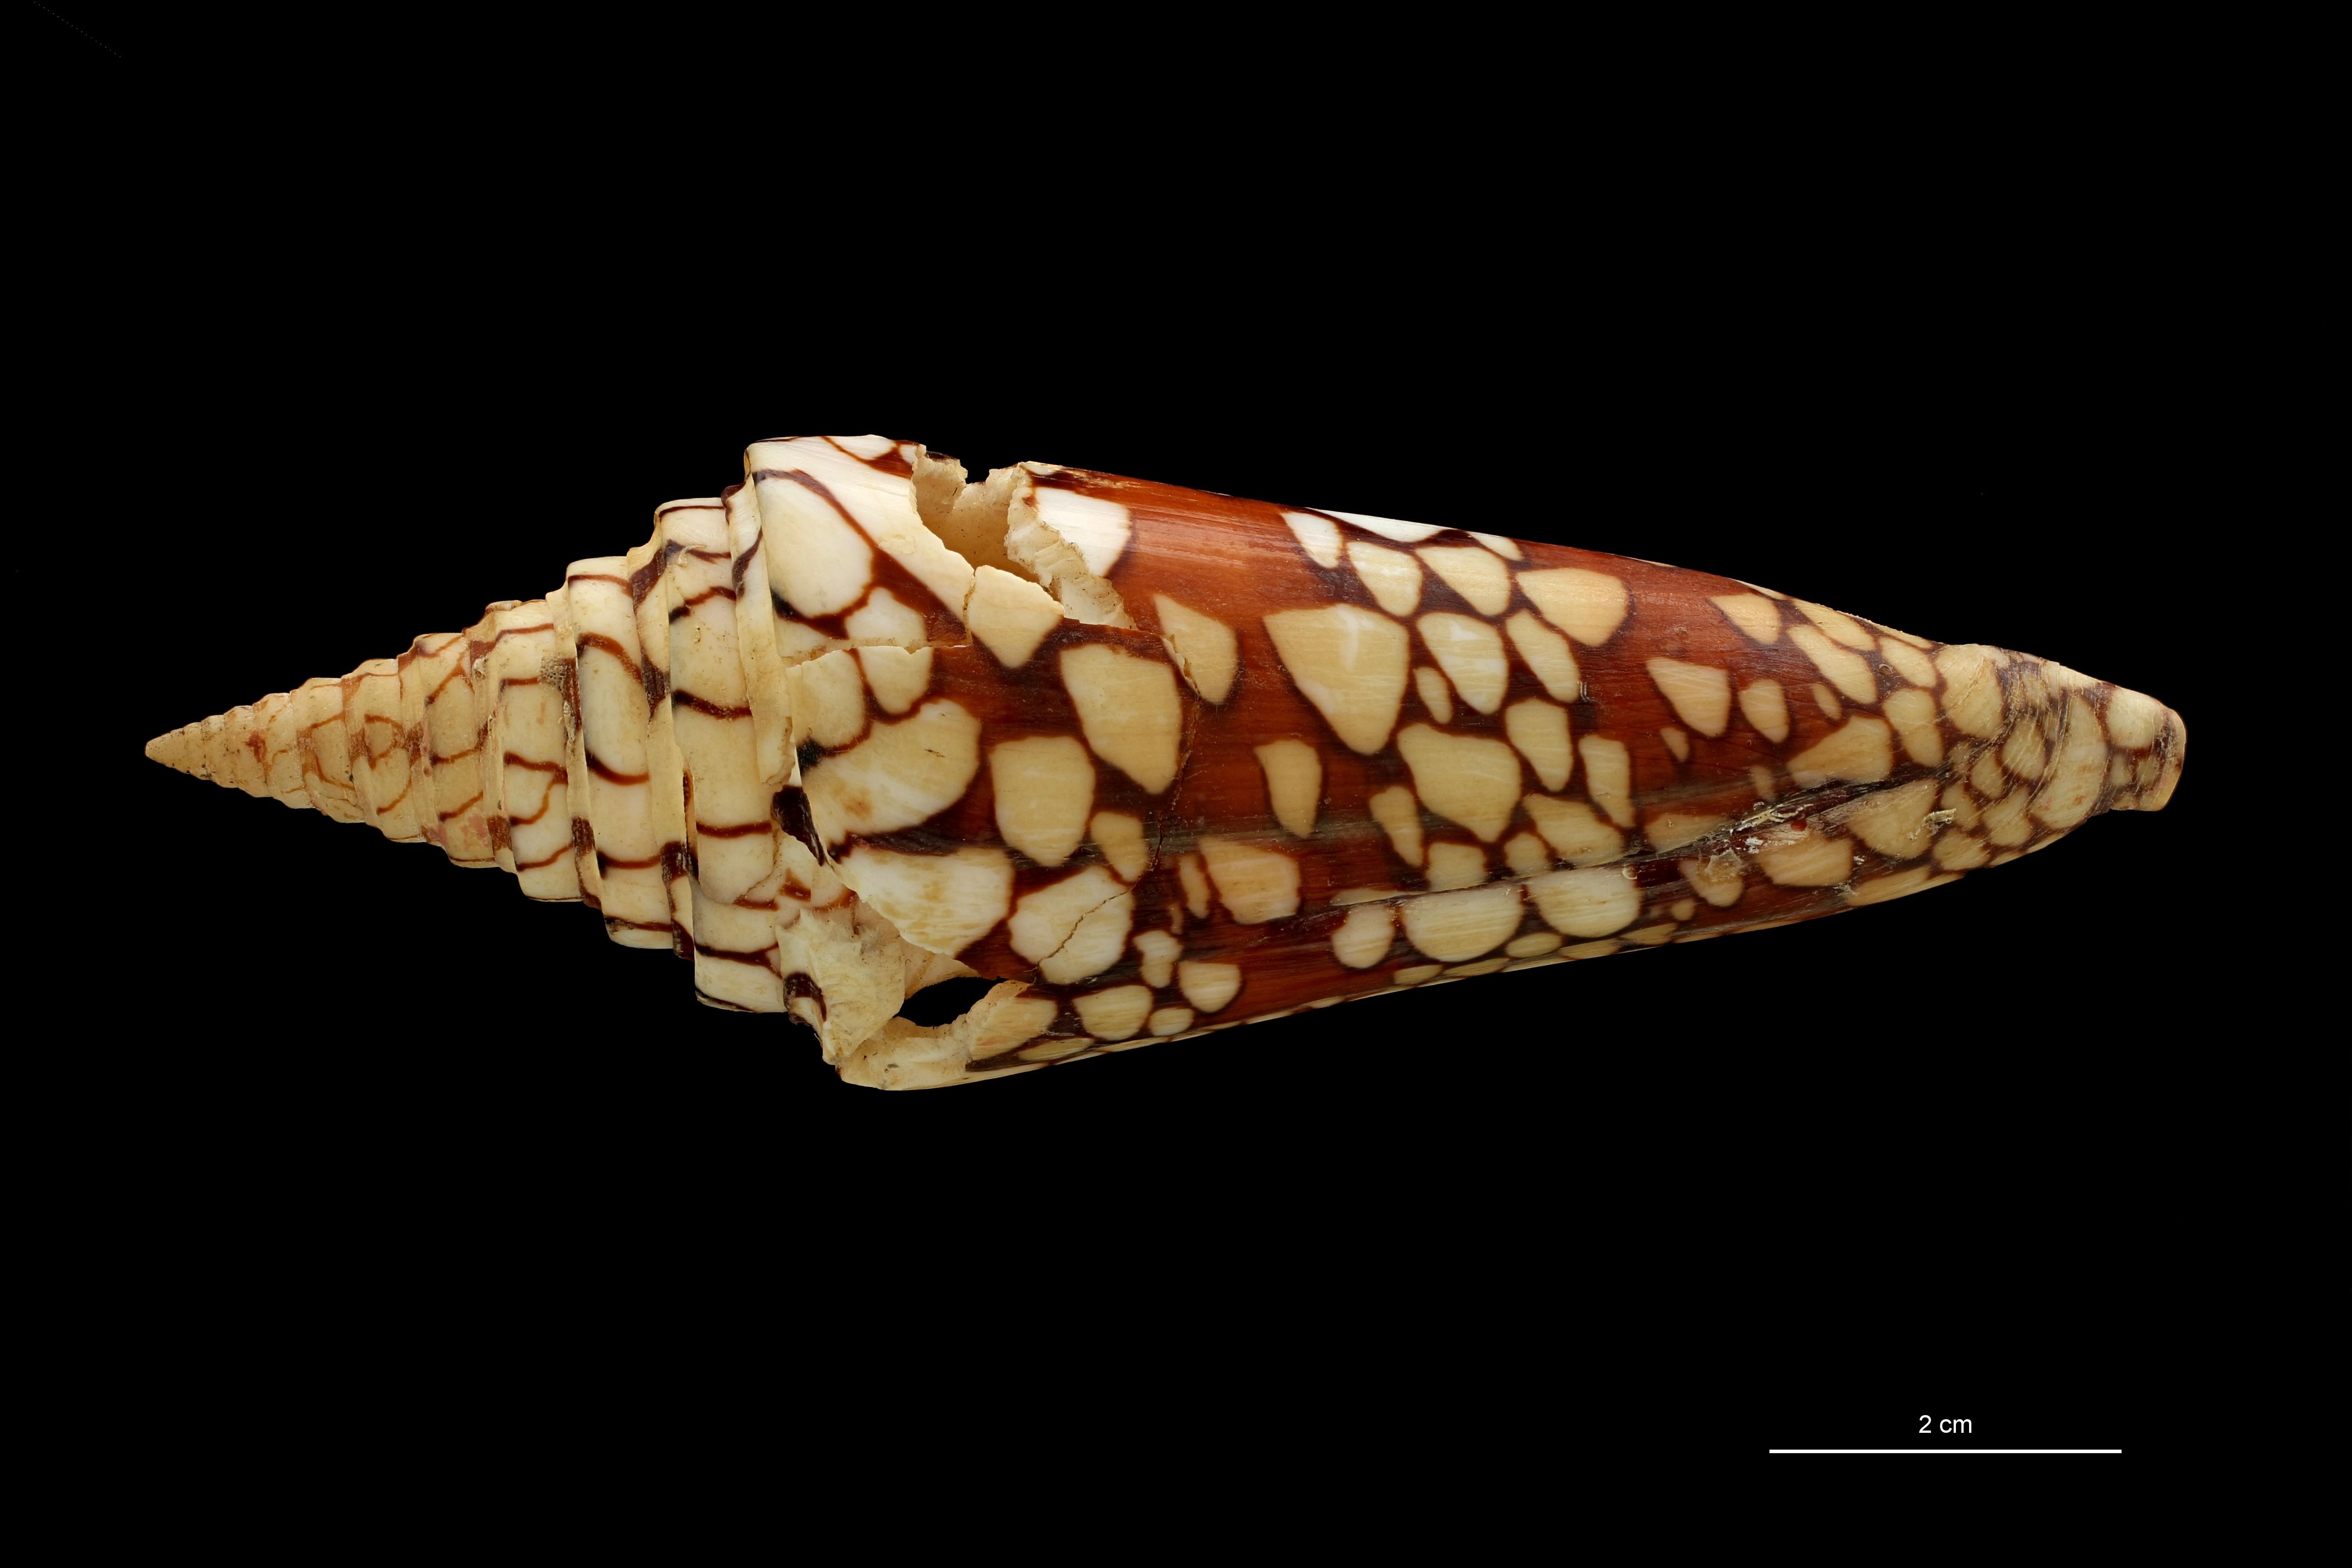 BE-RBINS-INV MT 448/1 Conus lemuriensis Ht D ZS PMax Scaled.jpg